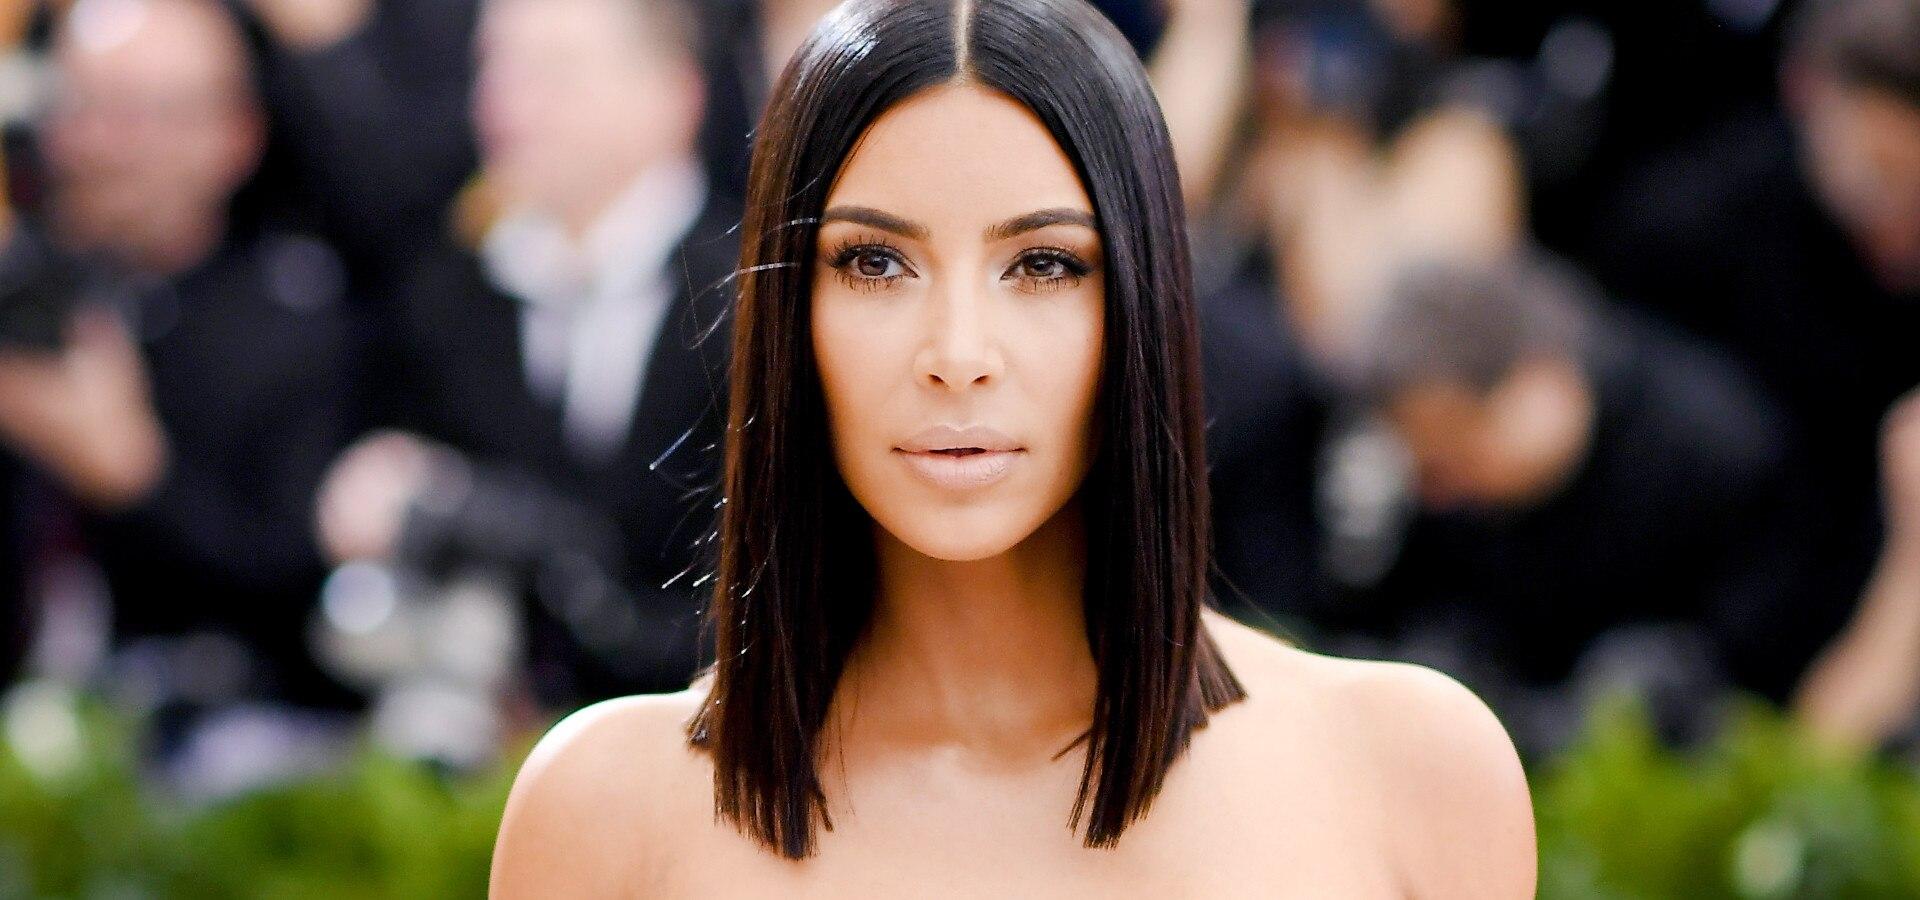 Kardashian avsugning flicka sexig porr Foto